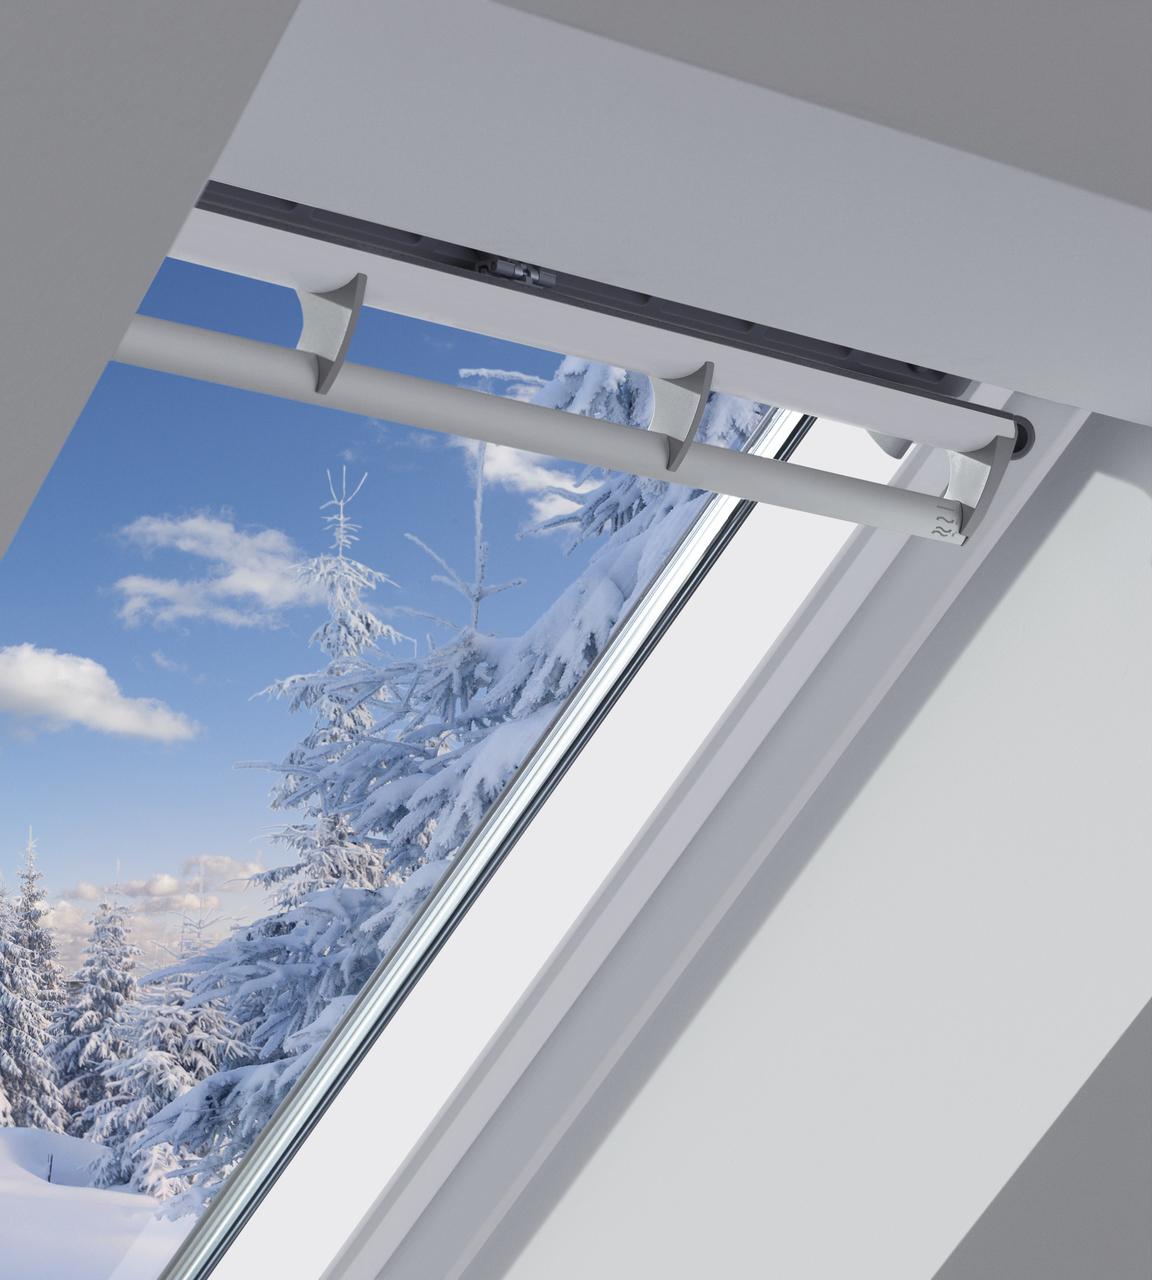 Serramenti e zone climatiche di trasmittanza termica - Trasmittanza termica finestre ...